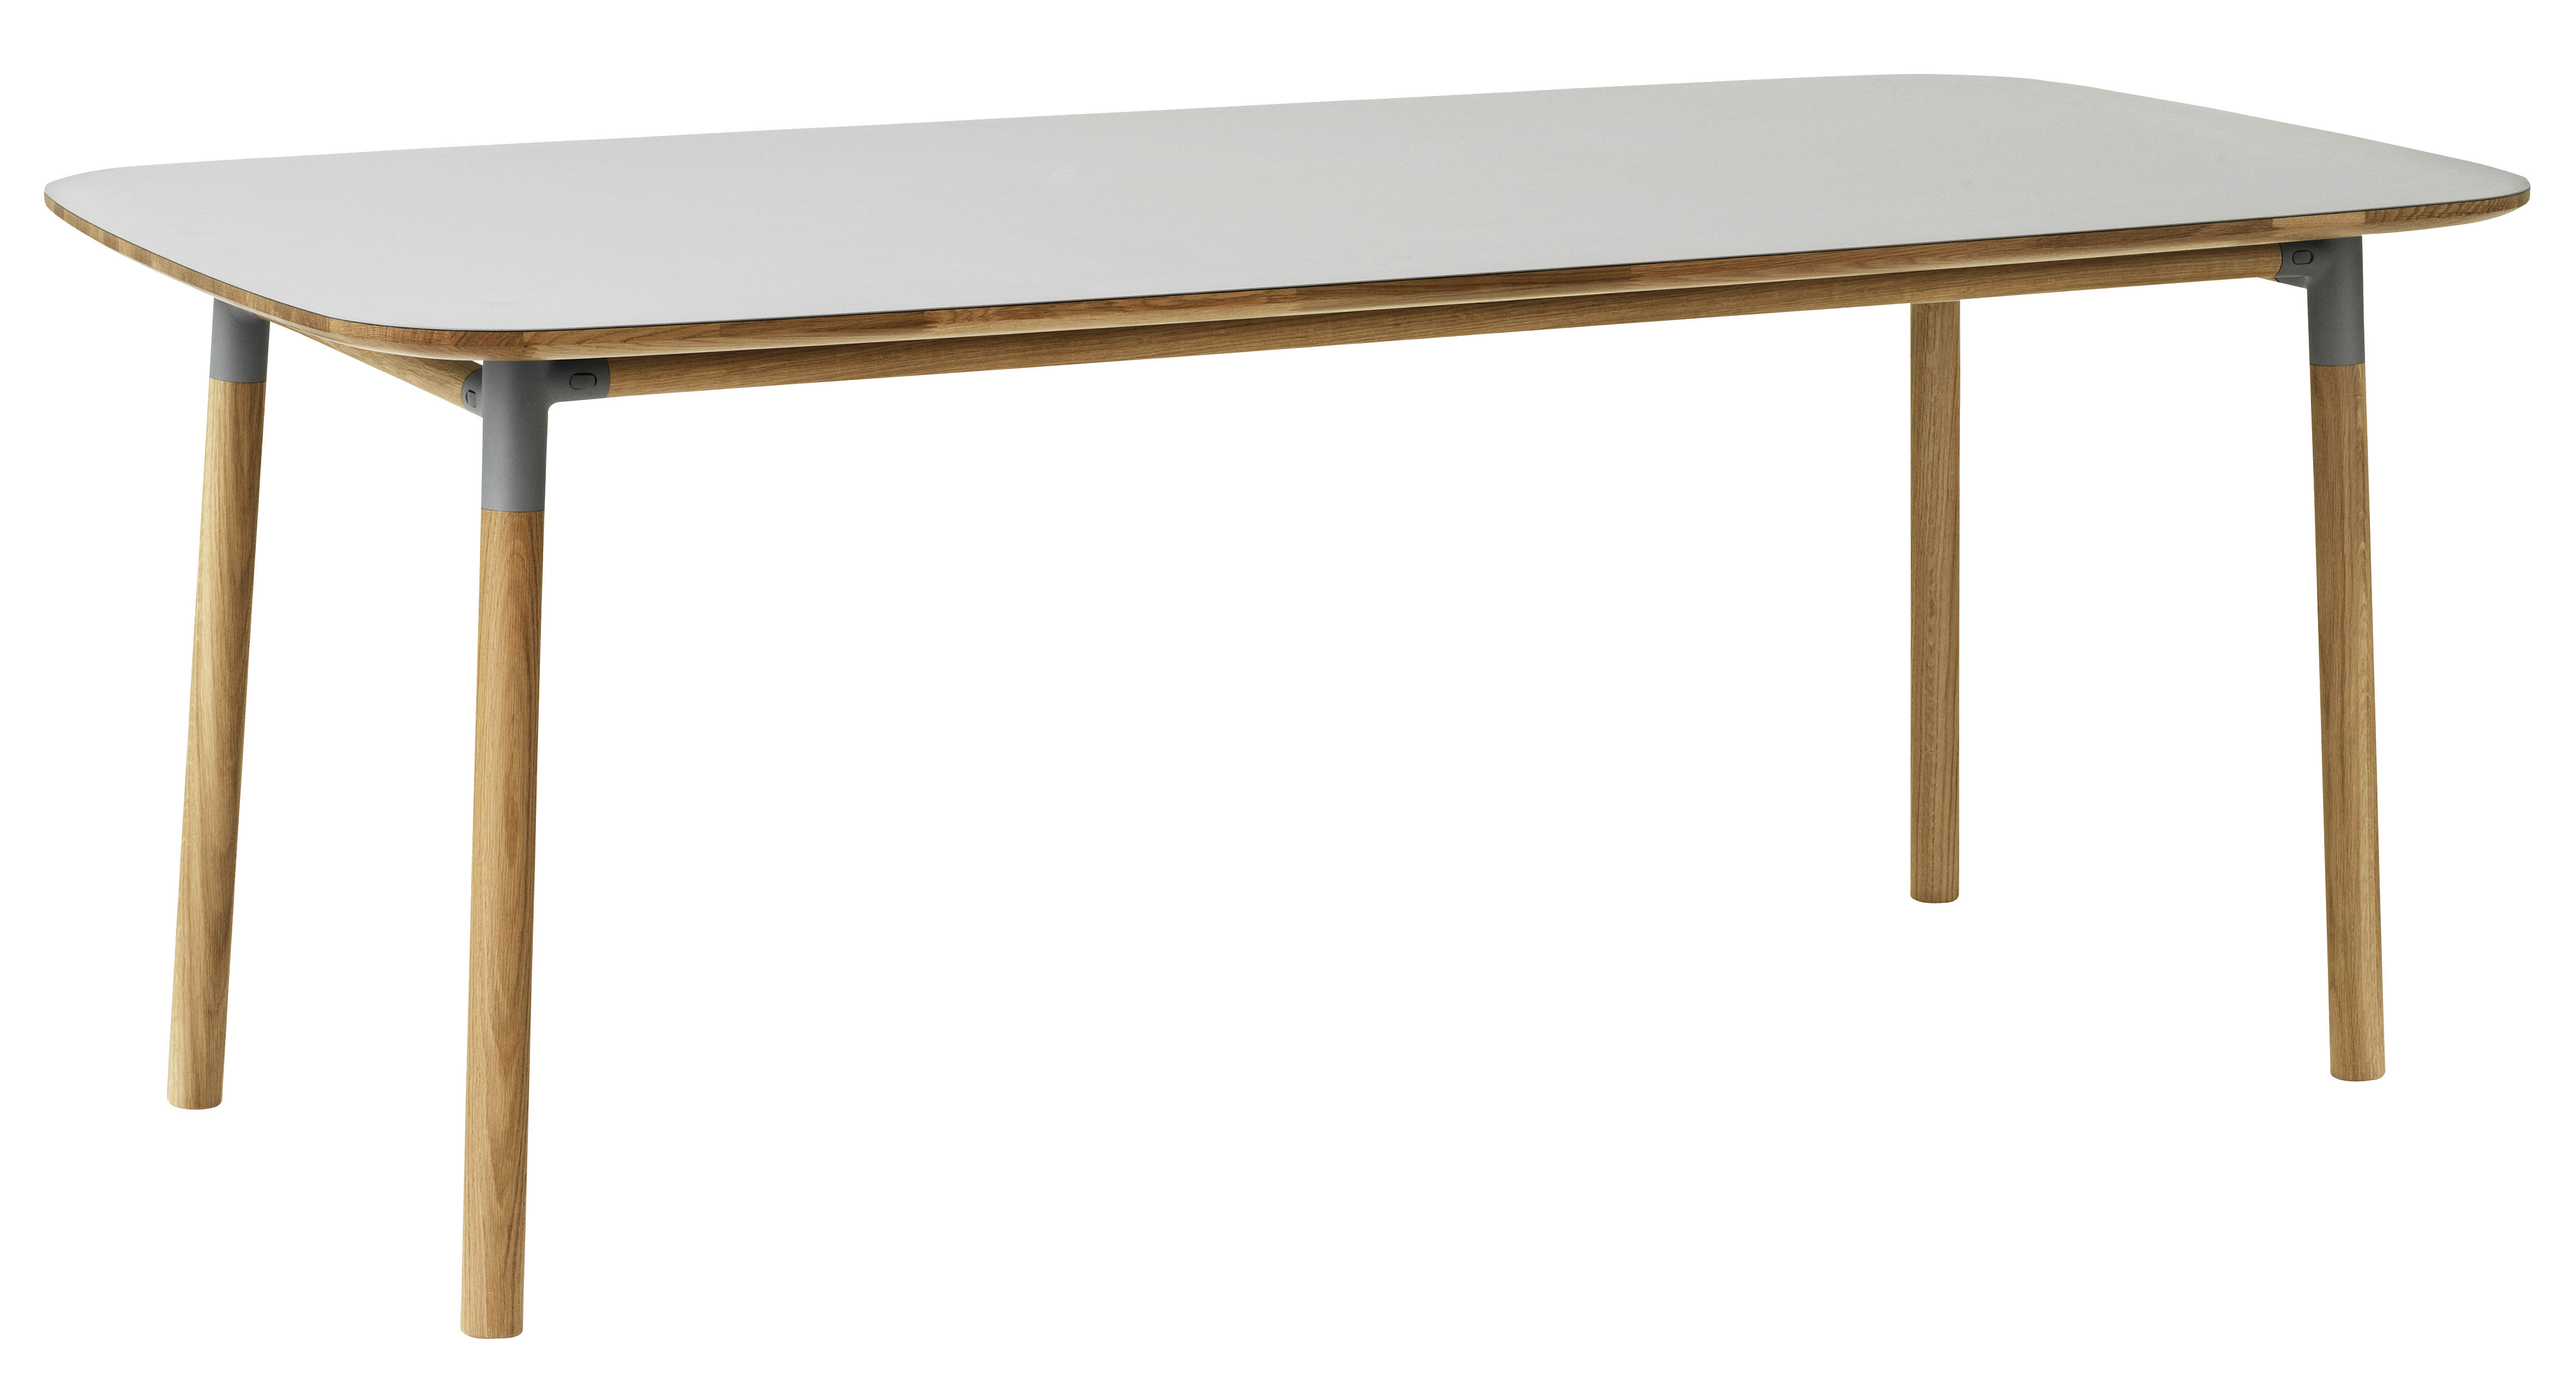 Form table 95 x 200 cm grey oak by normann copenhagen for Html form table